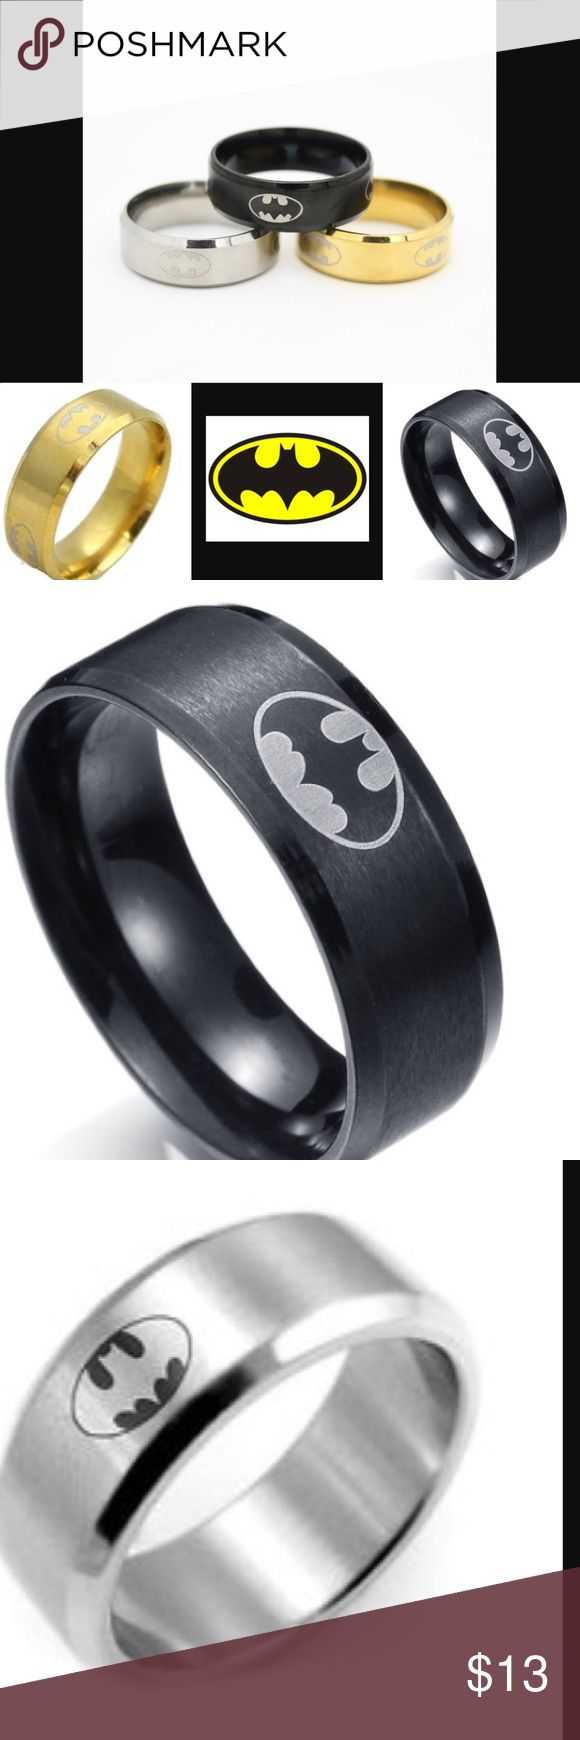 batman ring batman wedding ring Stainless steal Batman ring Stainless steal Batman logo ring 3 colors to choose from